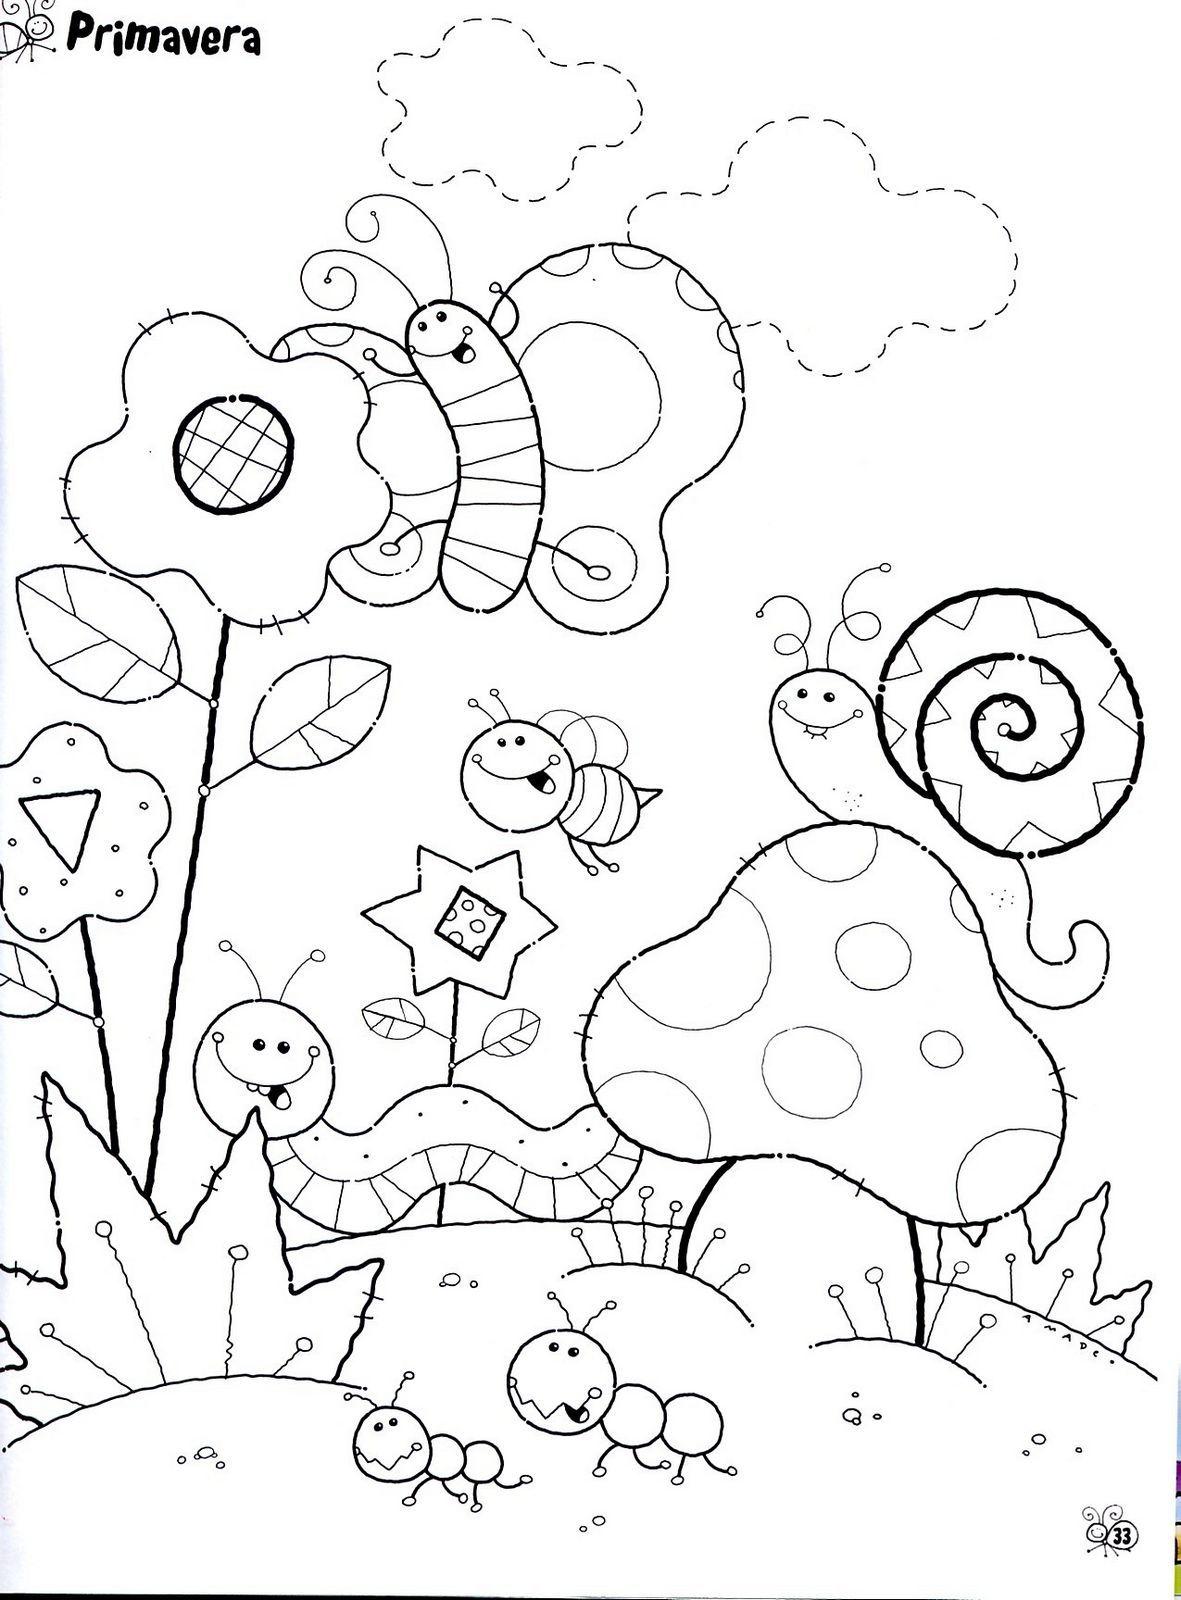 dibujos de primavera para colorear | Primavera | Pinterest